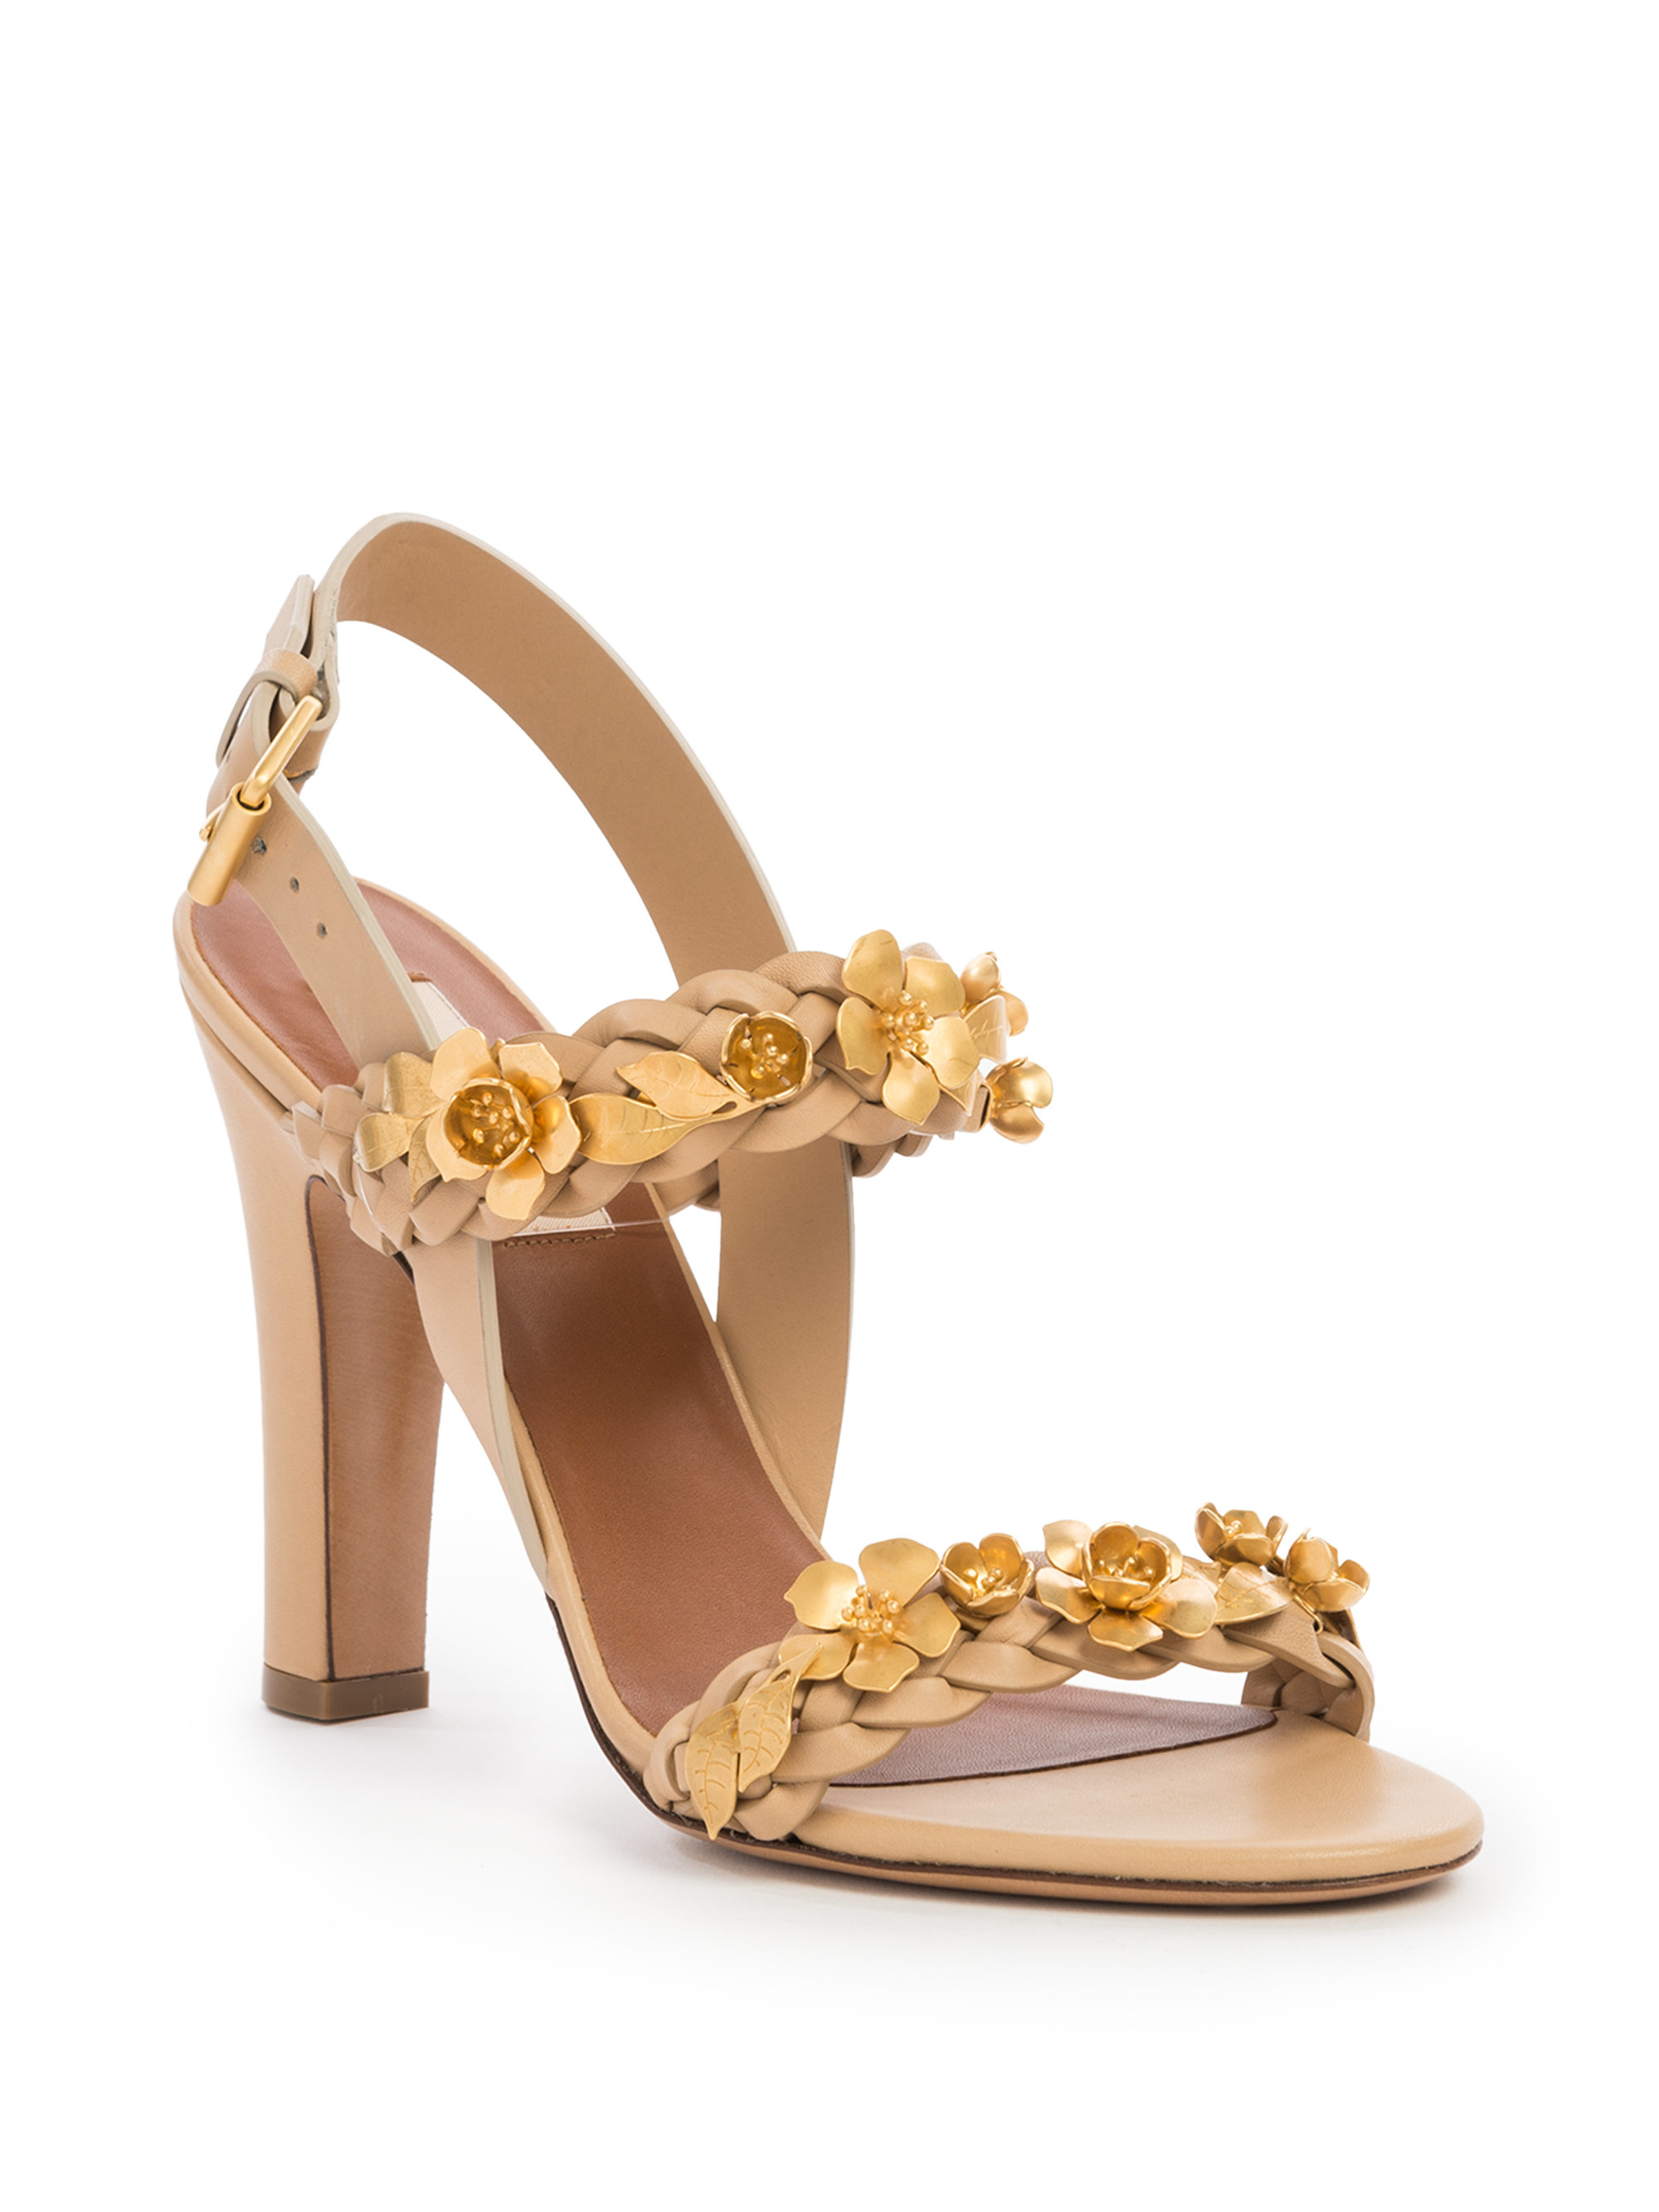 Valentino Leather Flower Sandals sale visit buy cheap choice discount big sale P9hh7Sj